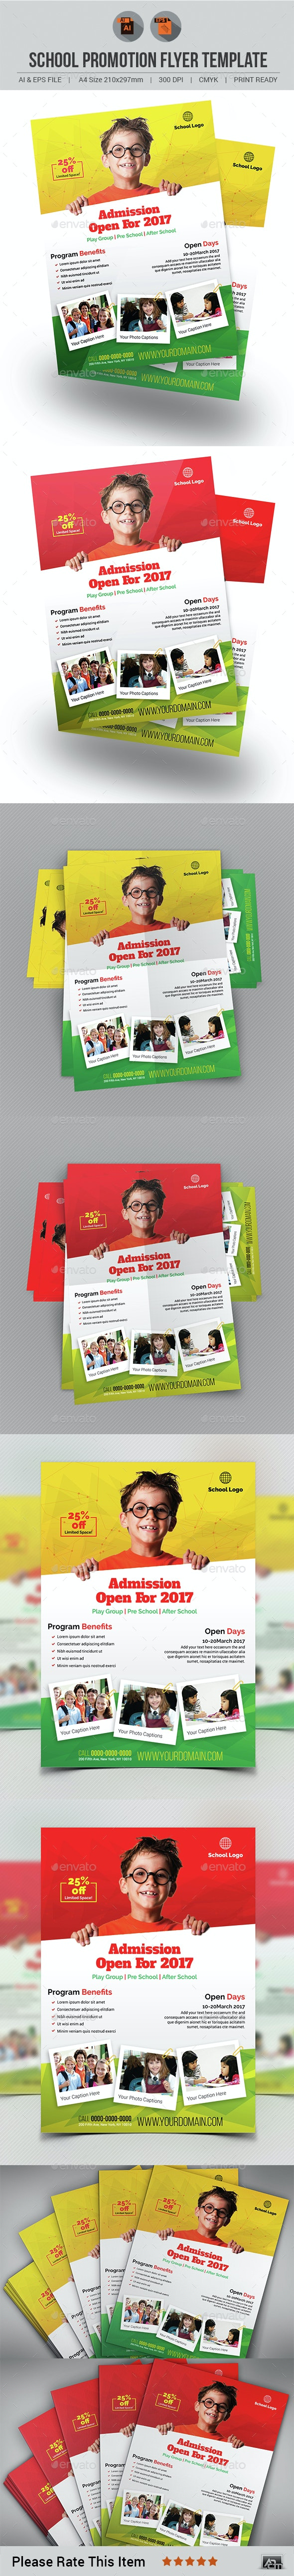 School Promotion Flyer Template - Corporate Flyers